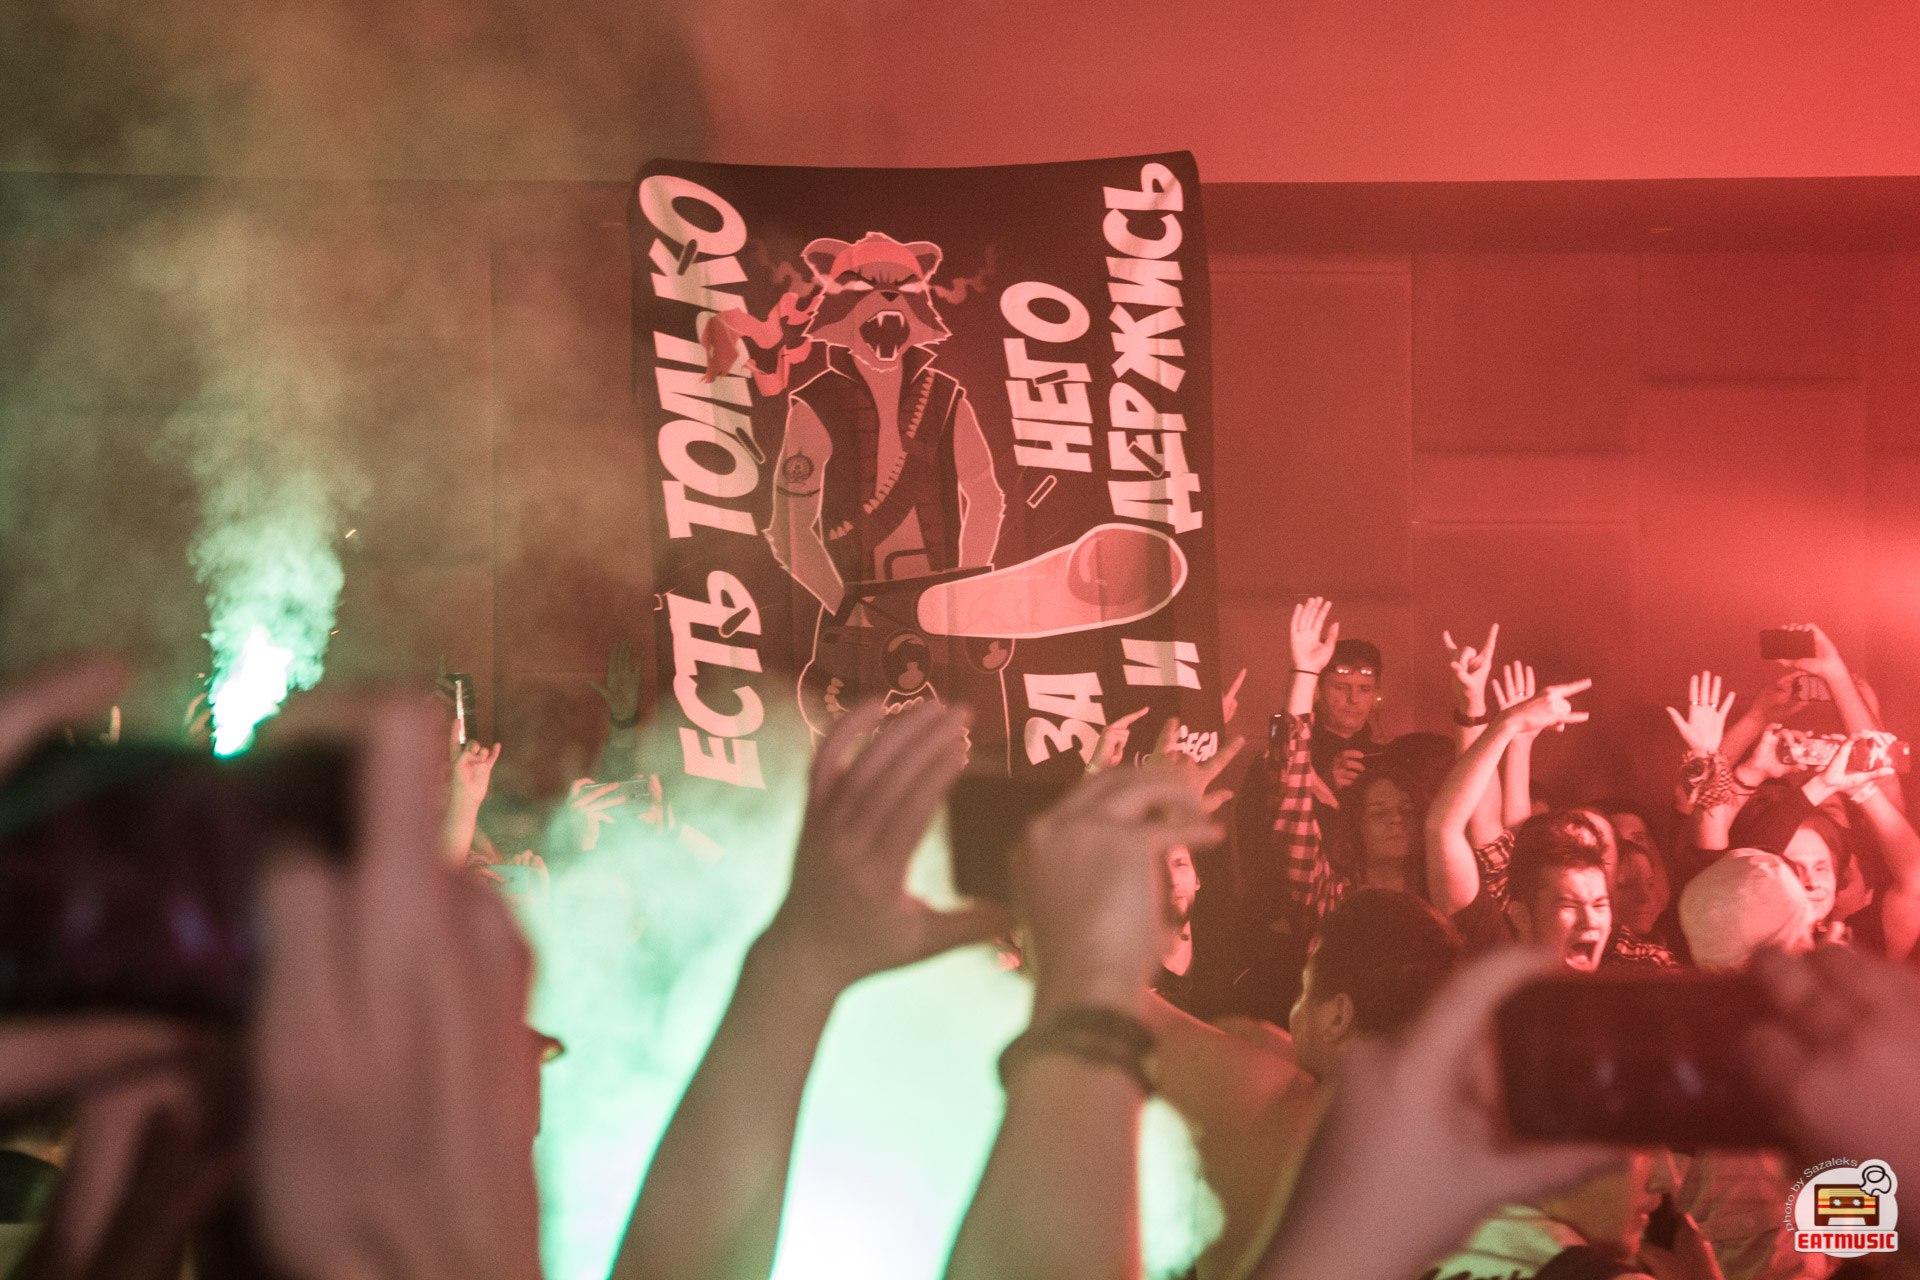 Pauzern Carnival 2018 группы Anacondaz: это мой хаос! Александр Сазонов